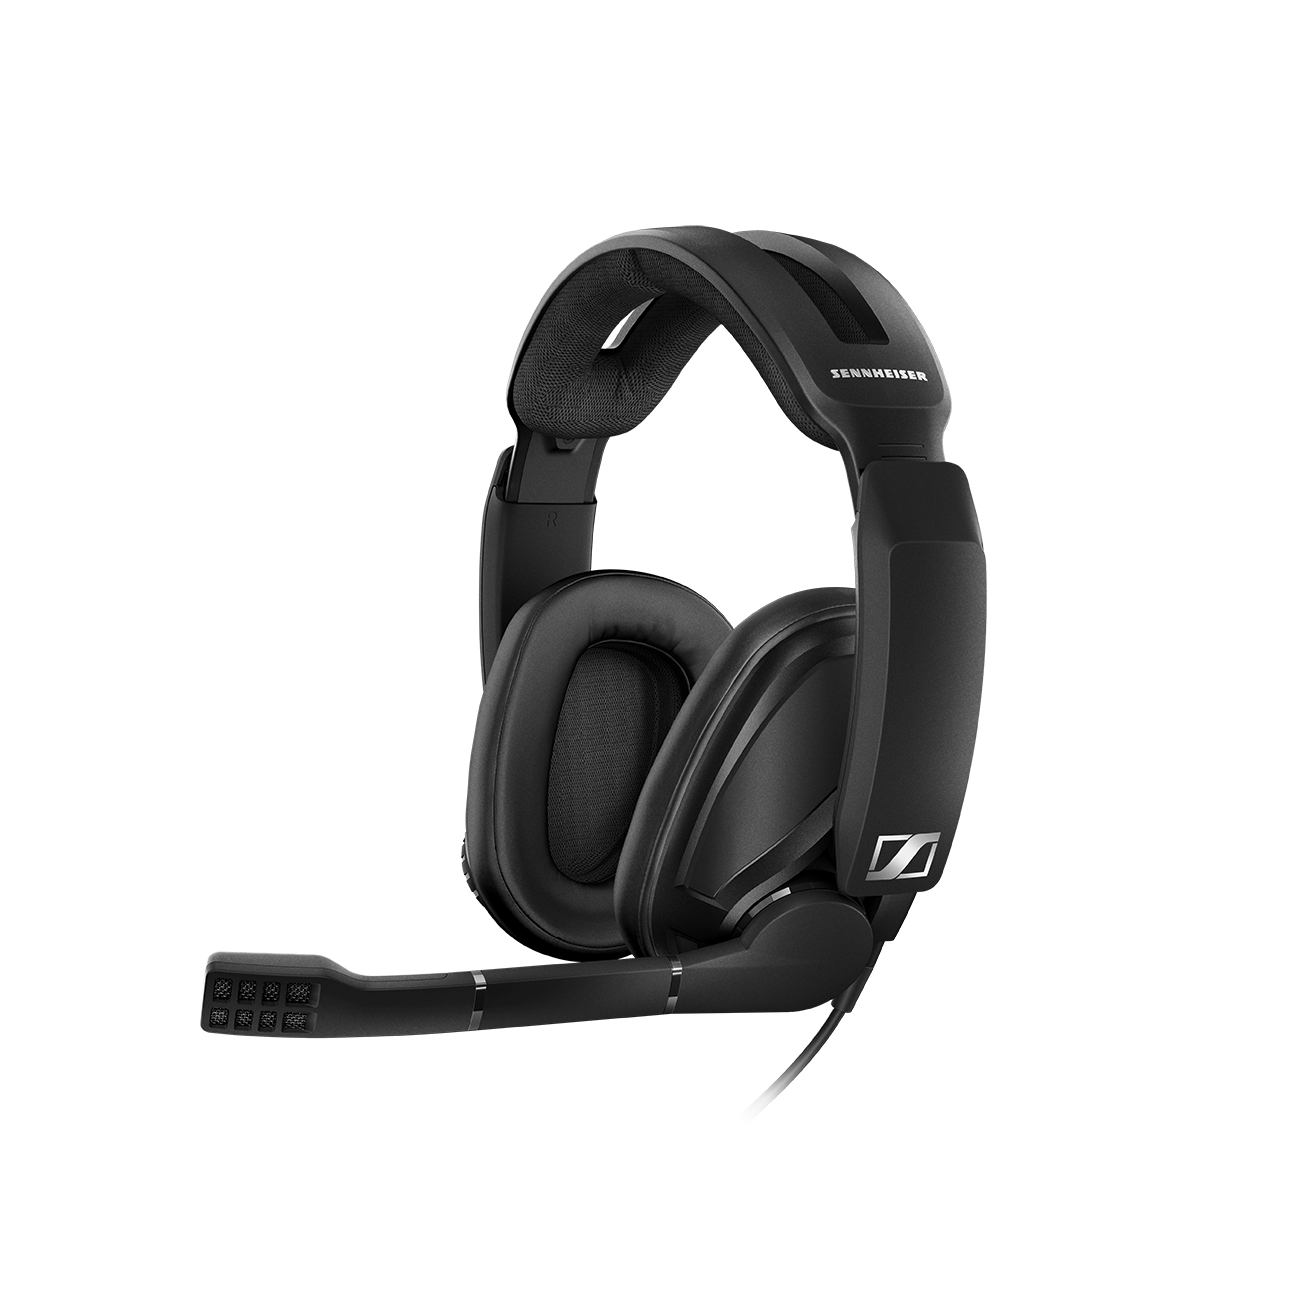 Billede af EPOS - Sennheiser - GSP 302 Gaming Headset